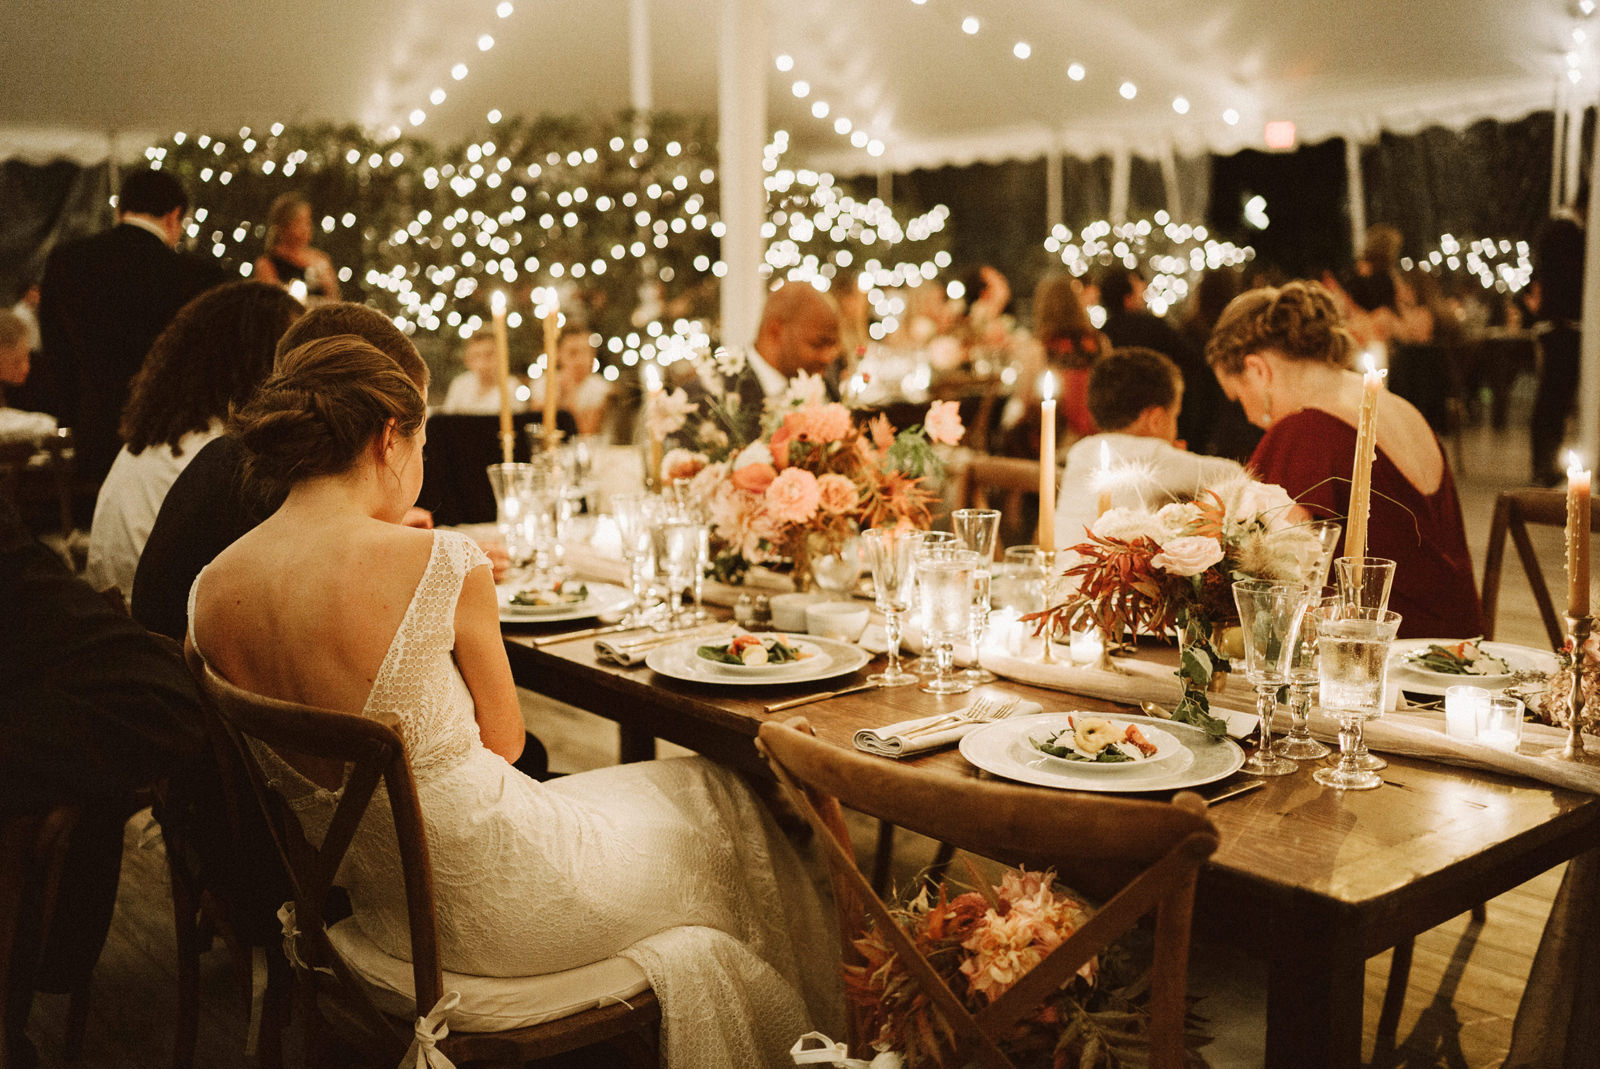 bridgeport-wedding-148 BRIDGEPORT, CONNECTICUT BACKYARD WEDDING